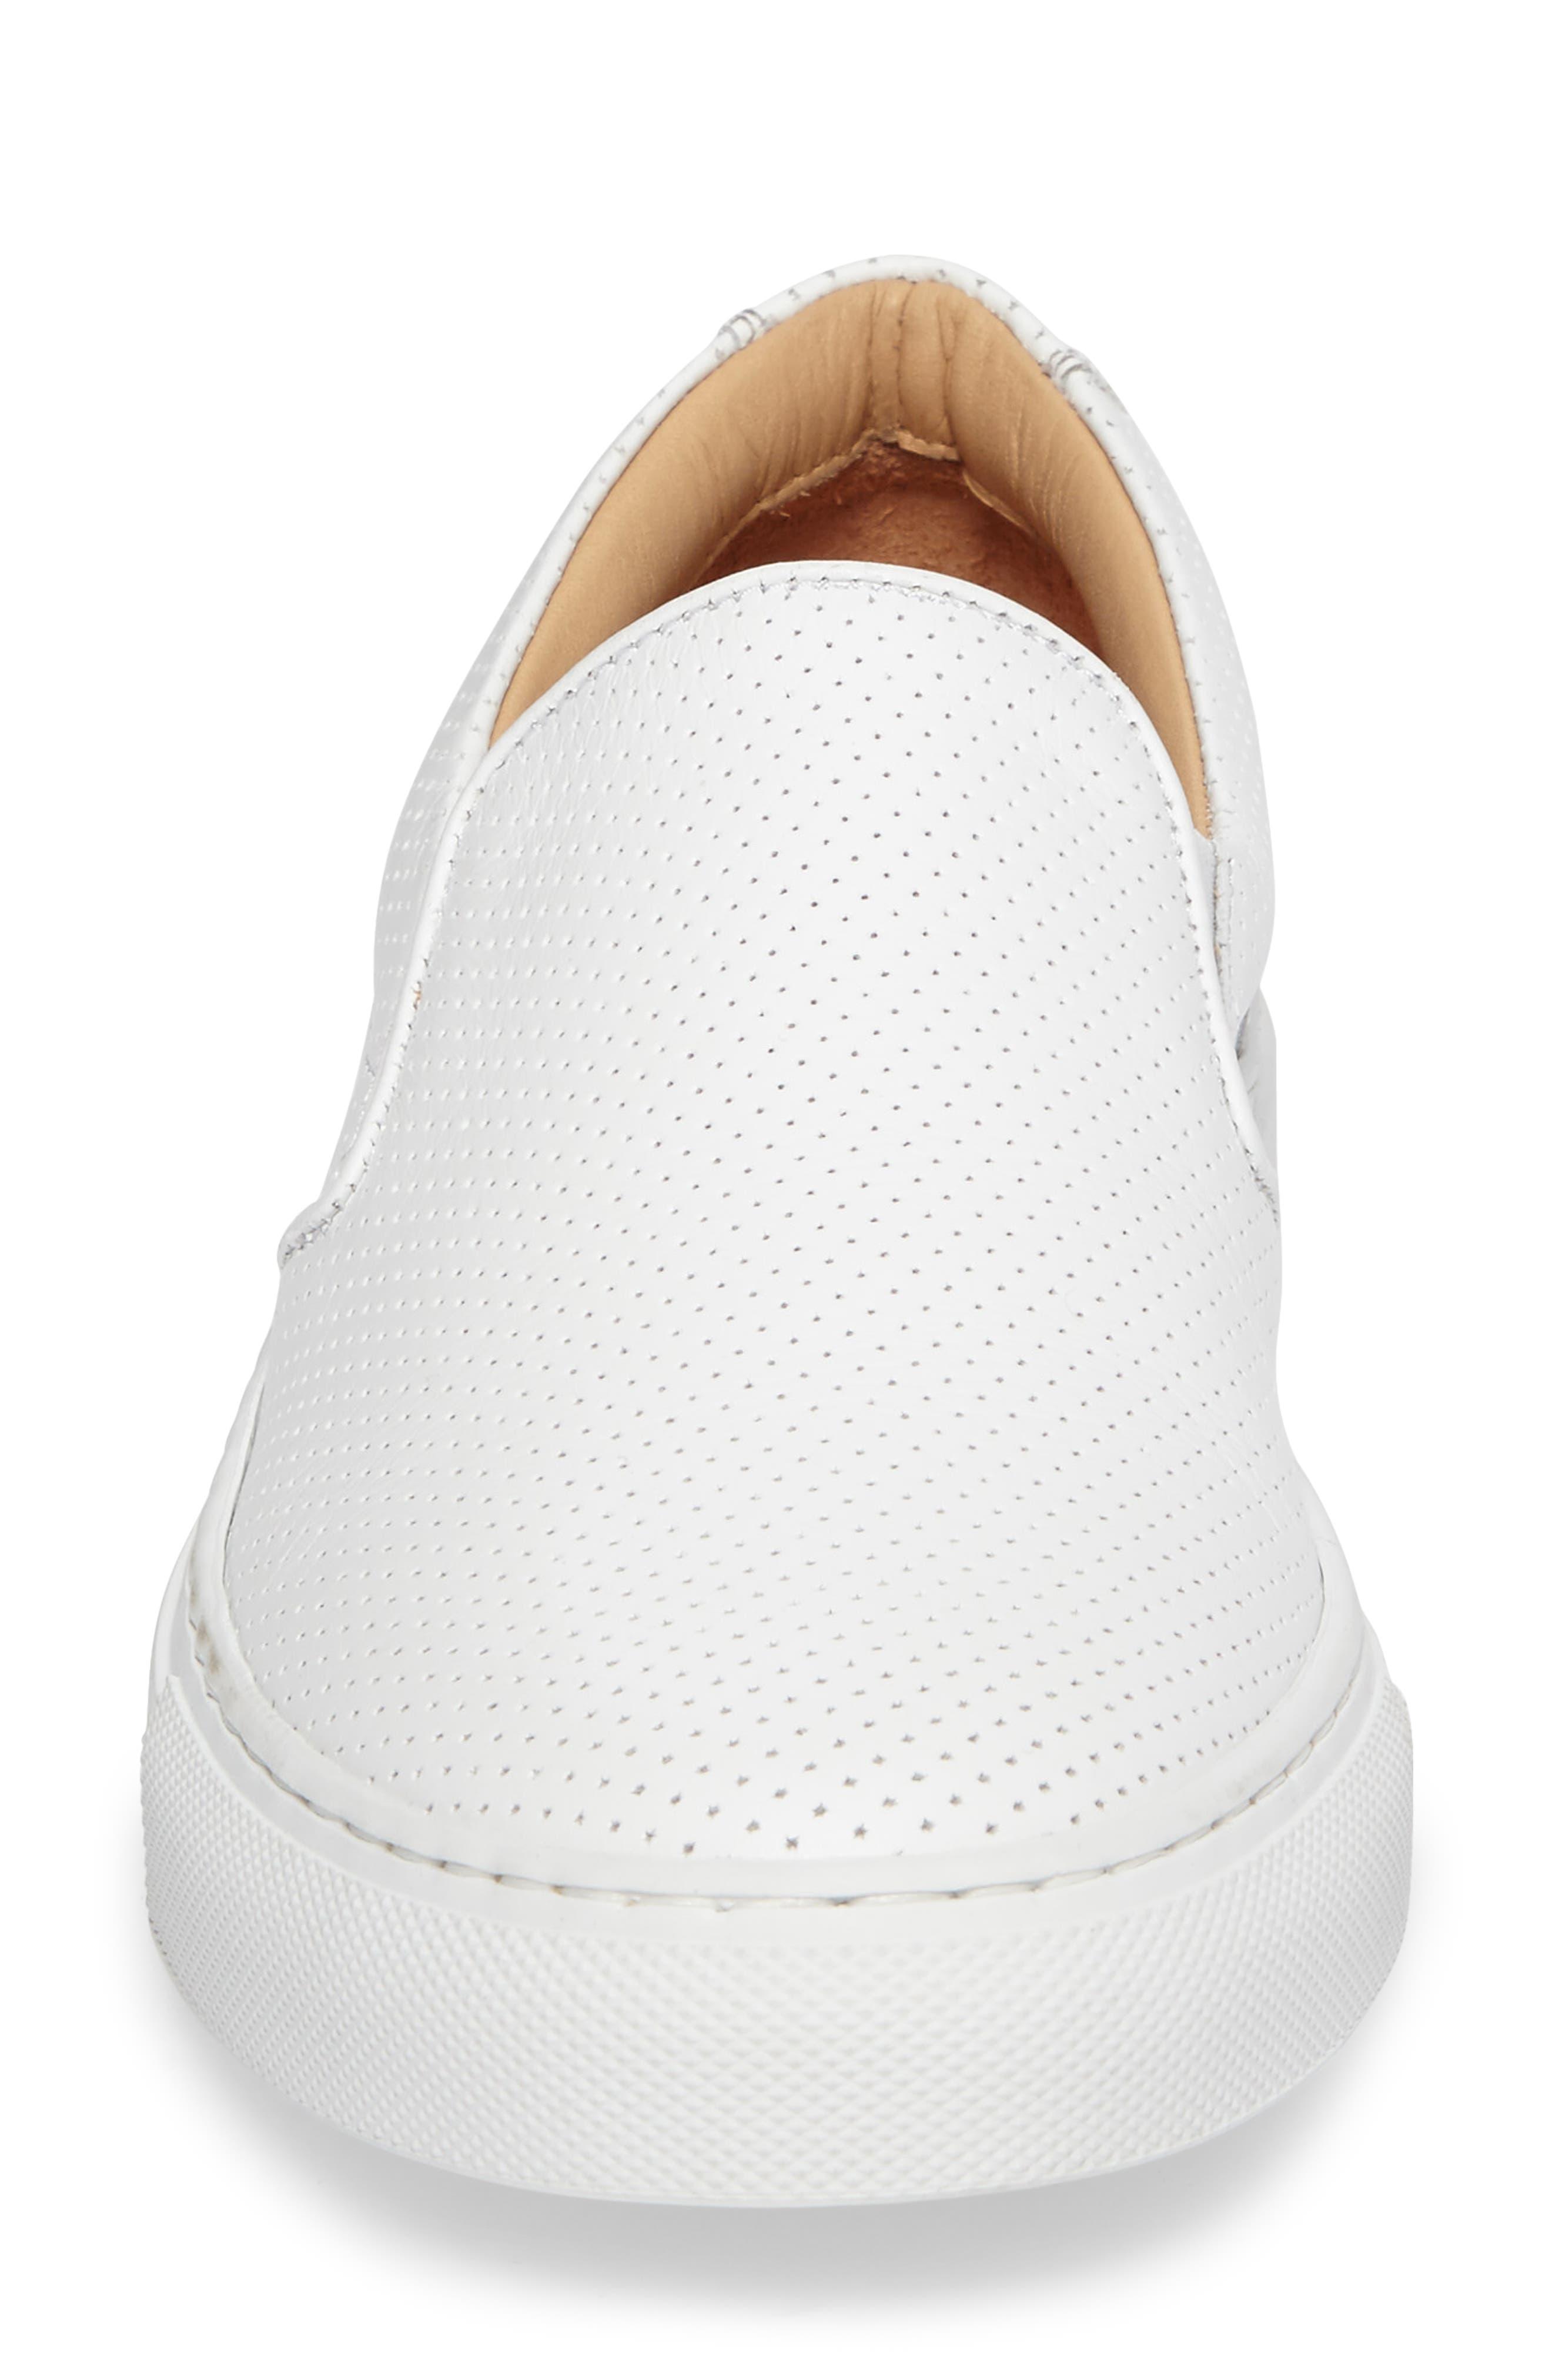 Wooster Slip-On Sneaker,                             Alternate thumbnail 4, color,                             WHITE PERFORATED